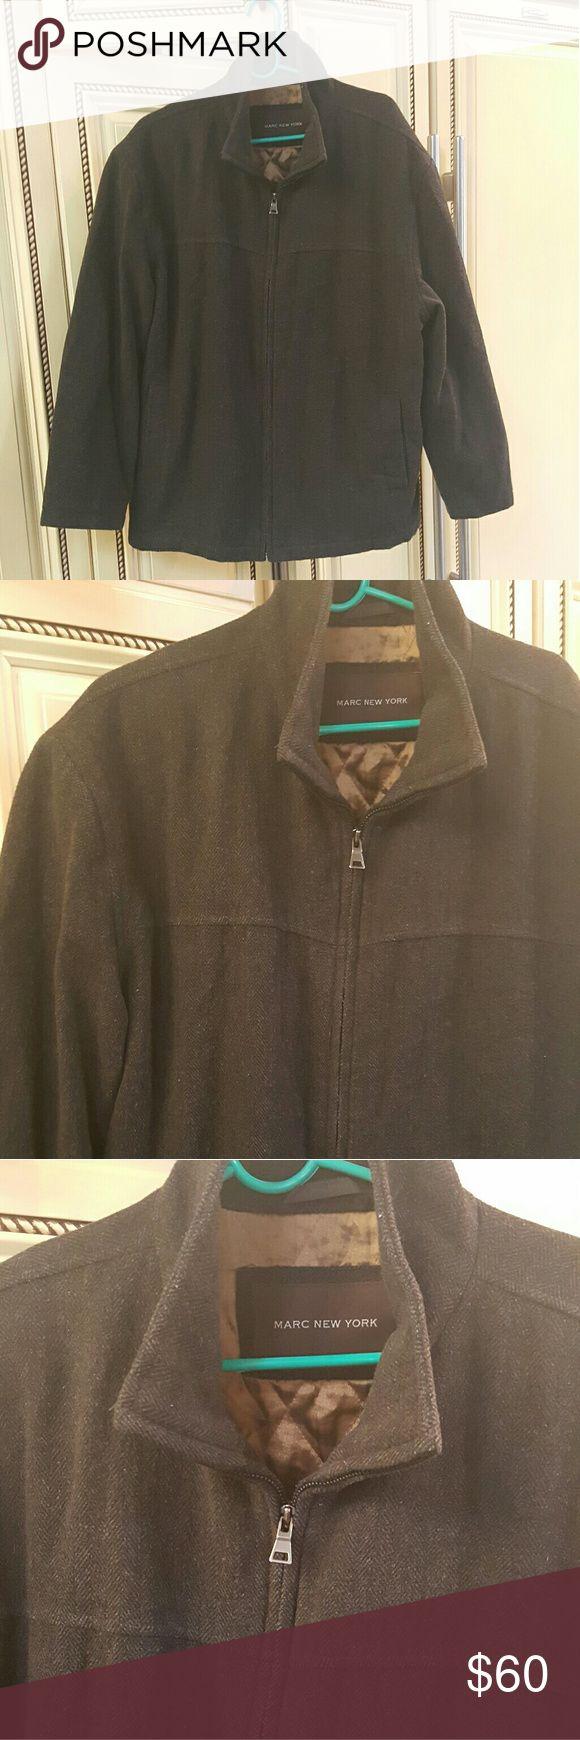 MENS- Marc New York peacoat Mens Marc ny brown Peacoat in great condition like new. Marc New York  Jackets & Coats Pea Coats